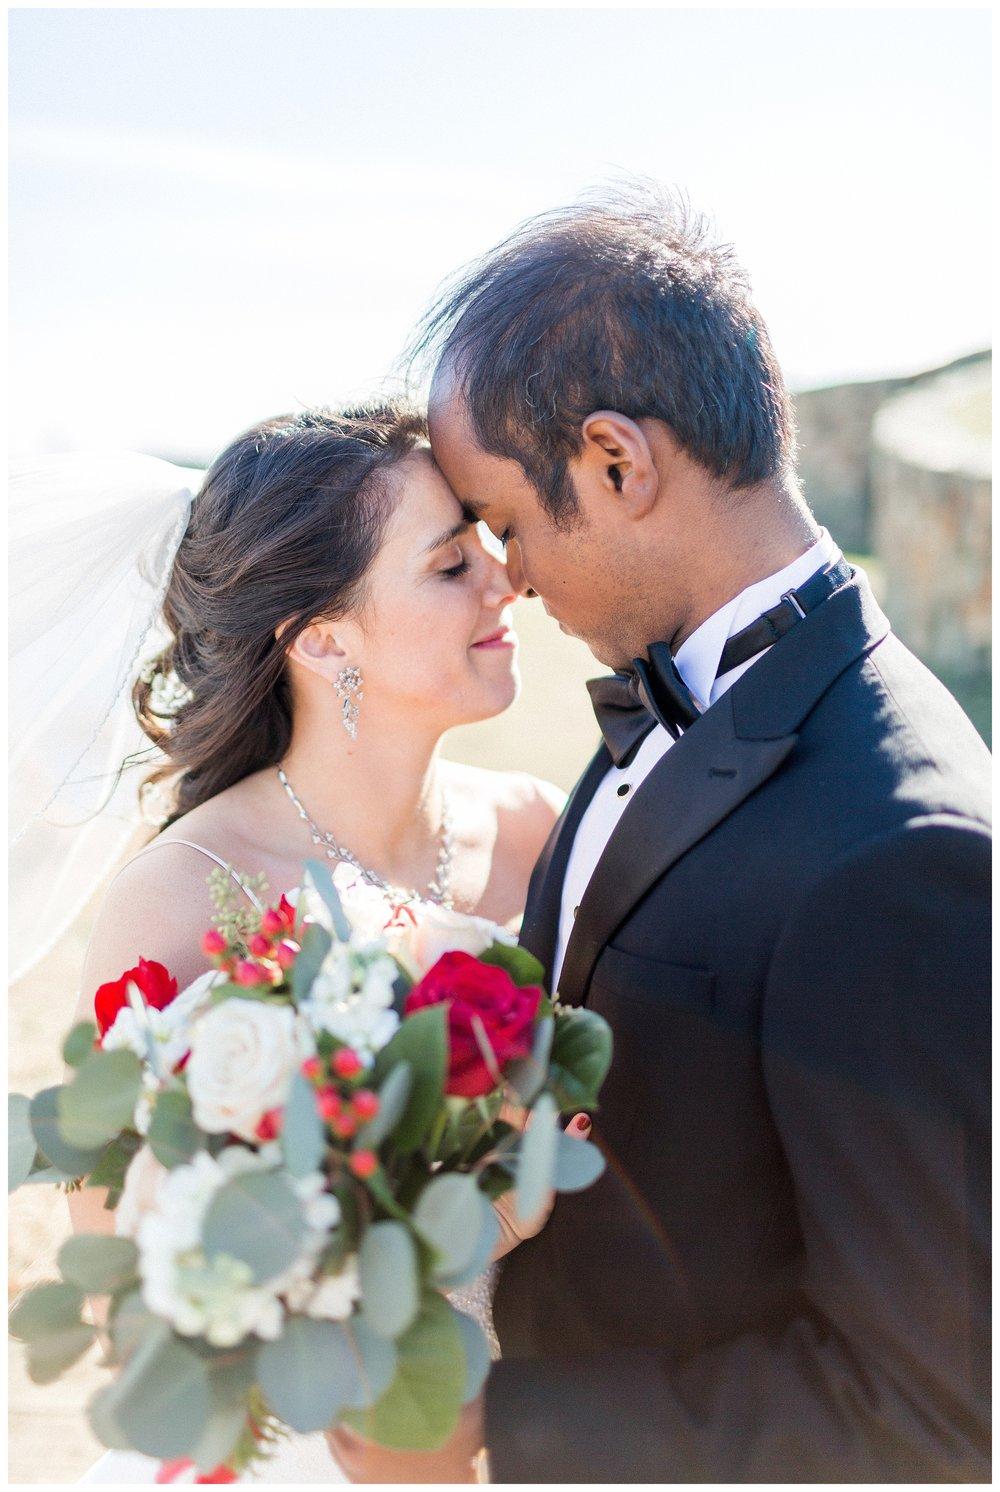 Stone Tower Winery Wedding | Virginia Winter Wedding | VA Wedding Photographer Kir Tuben_0060.jpg